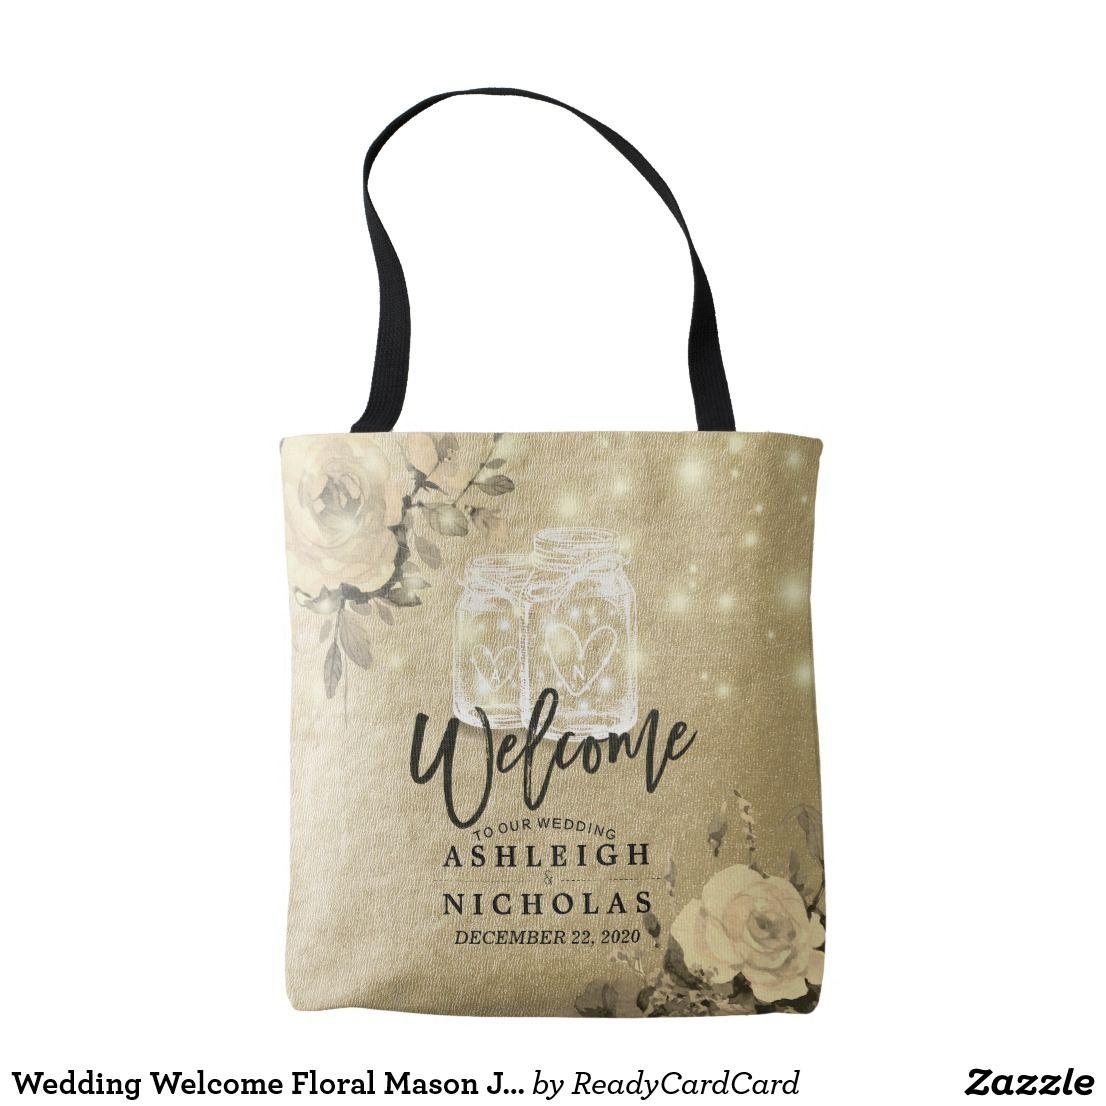 Wedding Welcome Floral Mason Jar String Light Gold Tote Bag Wedding ...